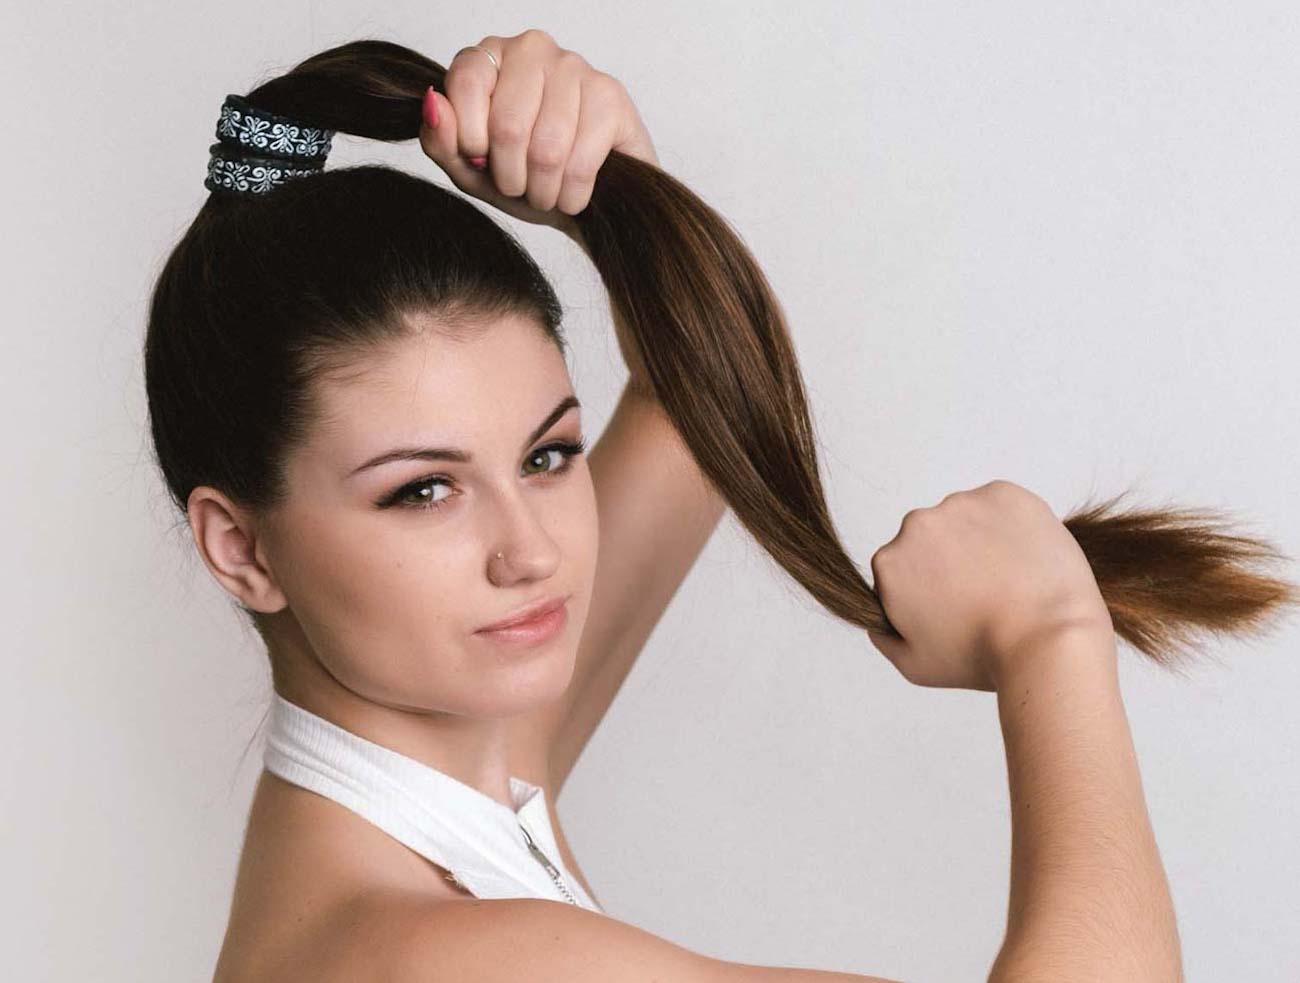 Pony-O Revolutionary Hair Accessories